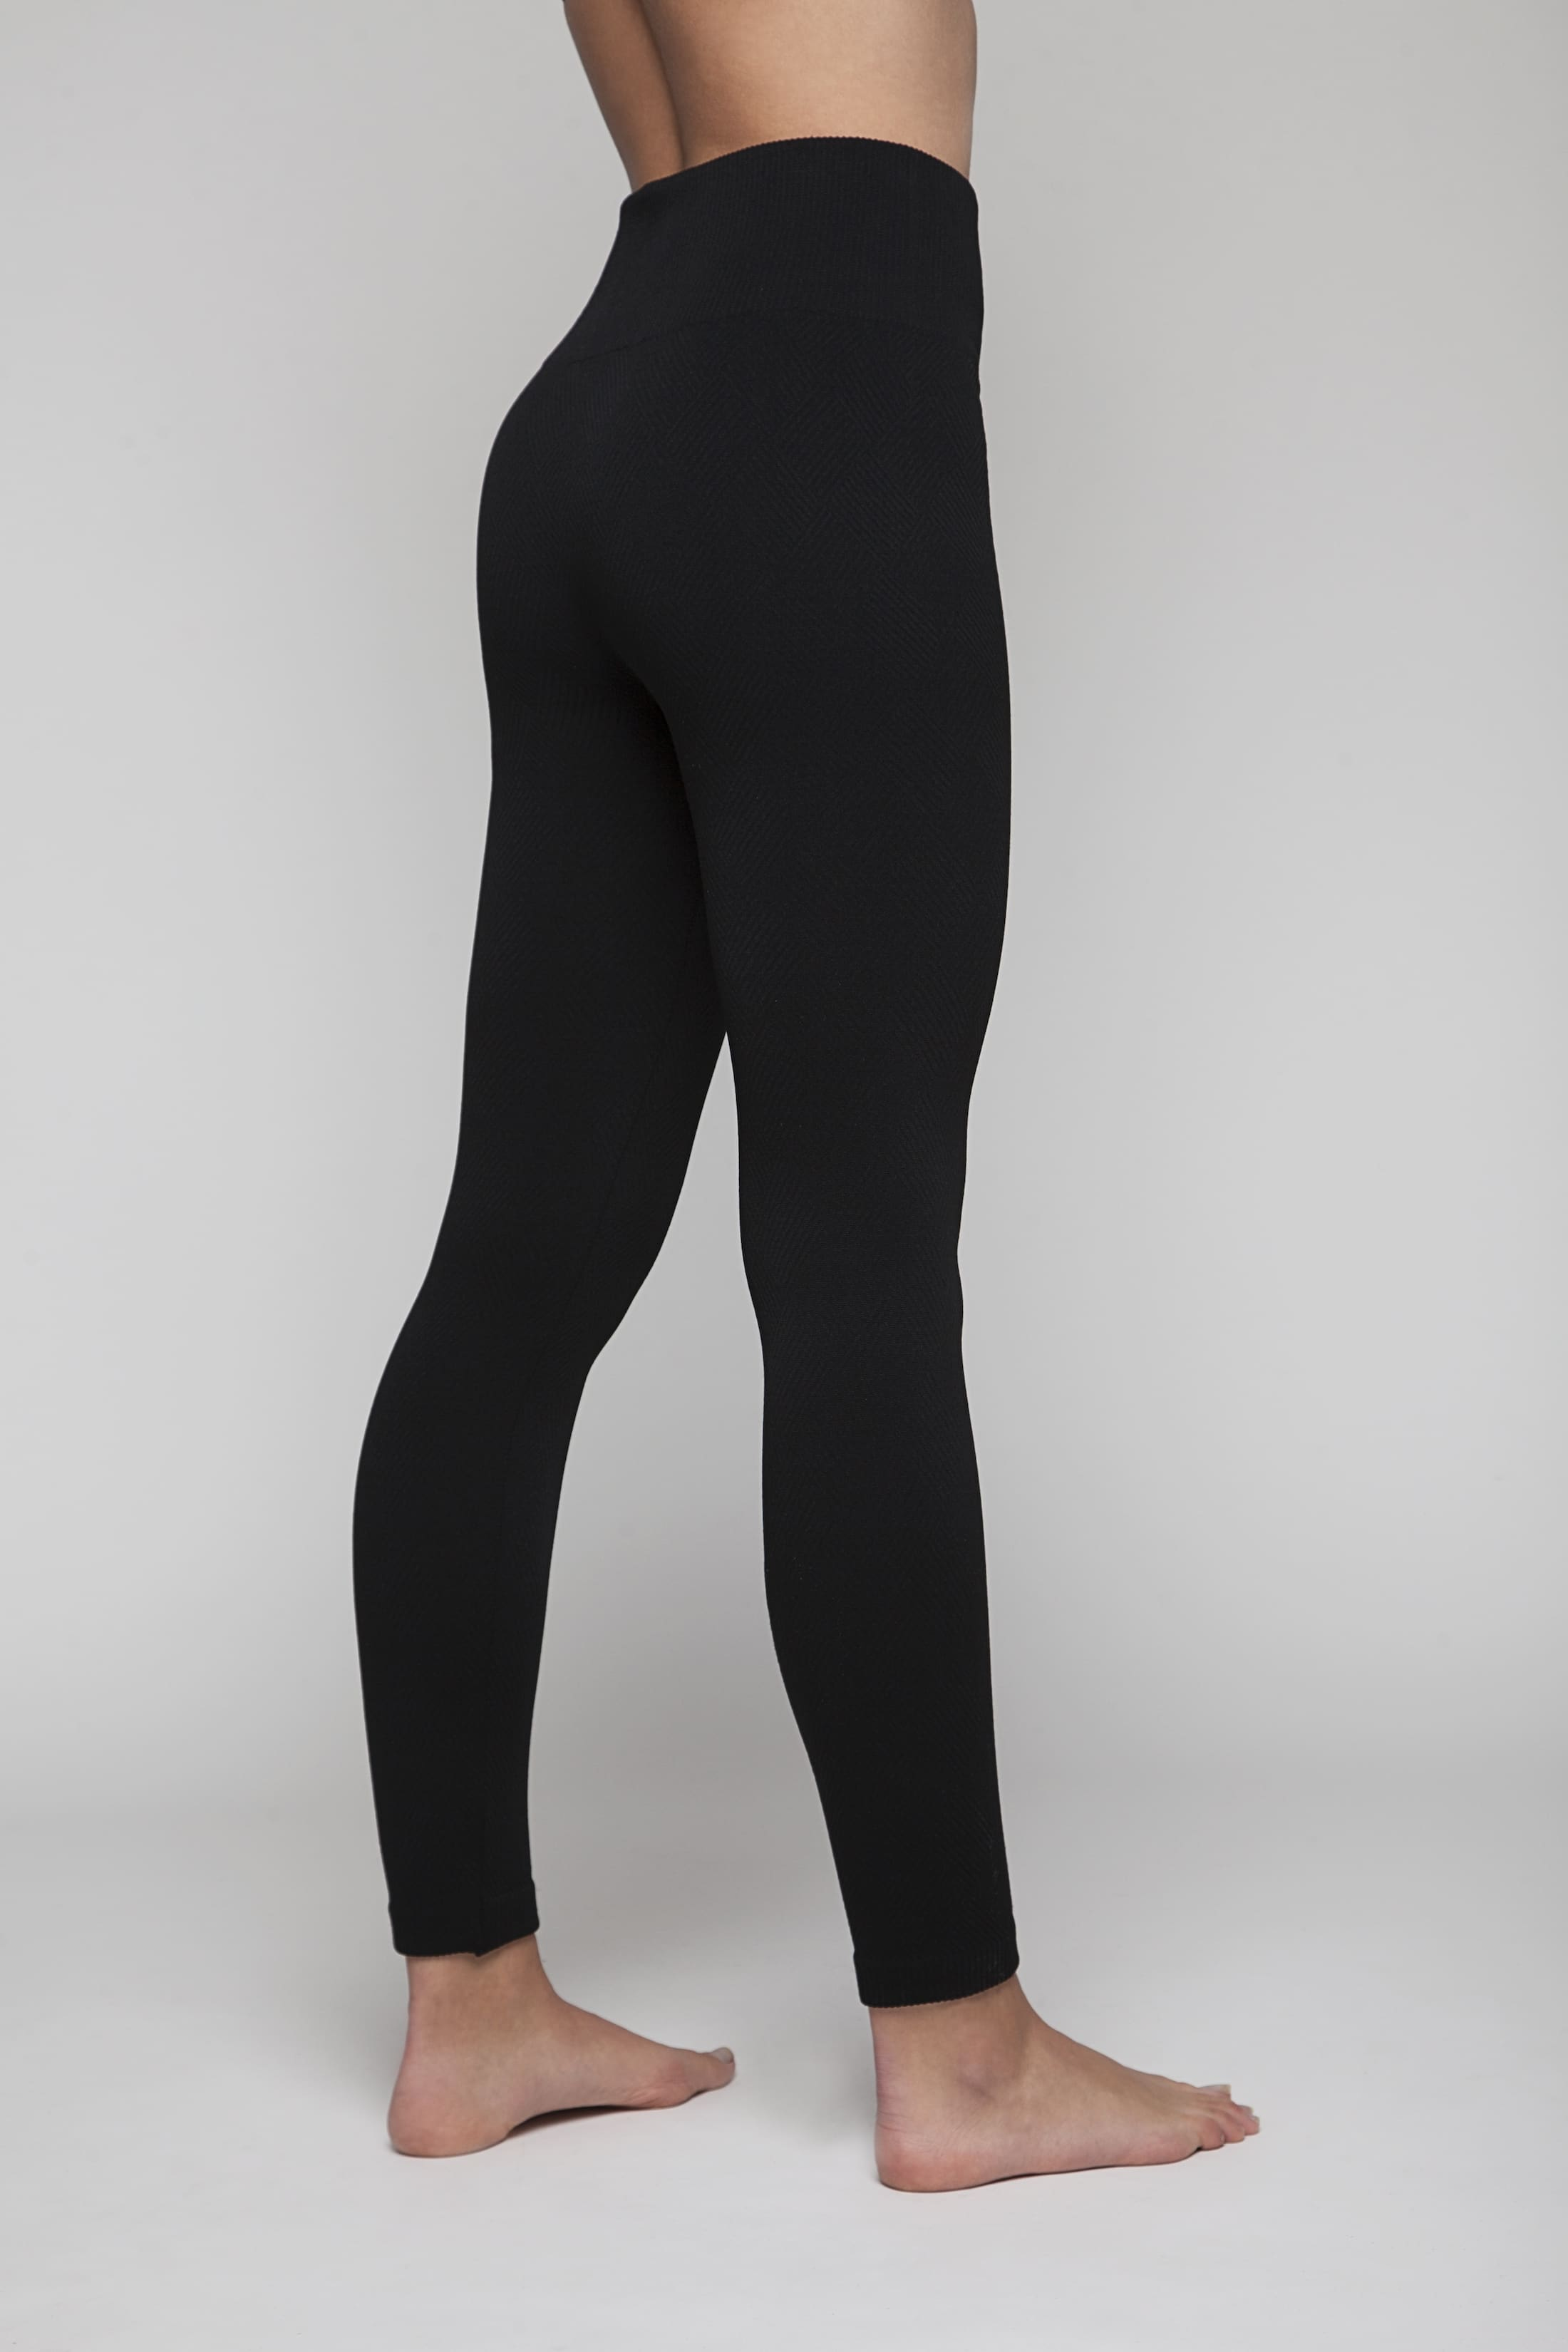 Black extra-soft leggings (structured)